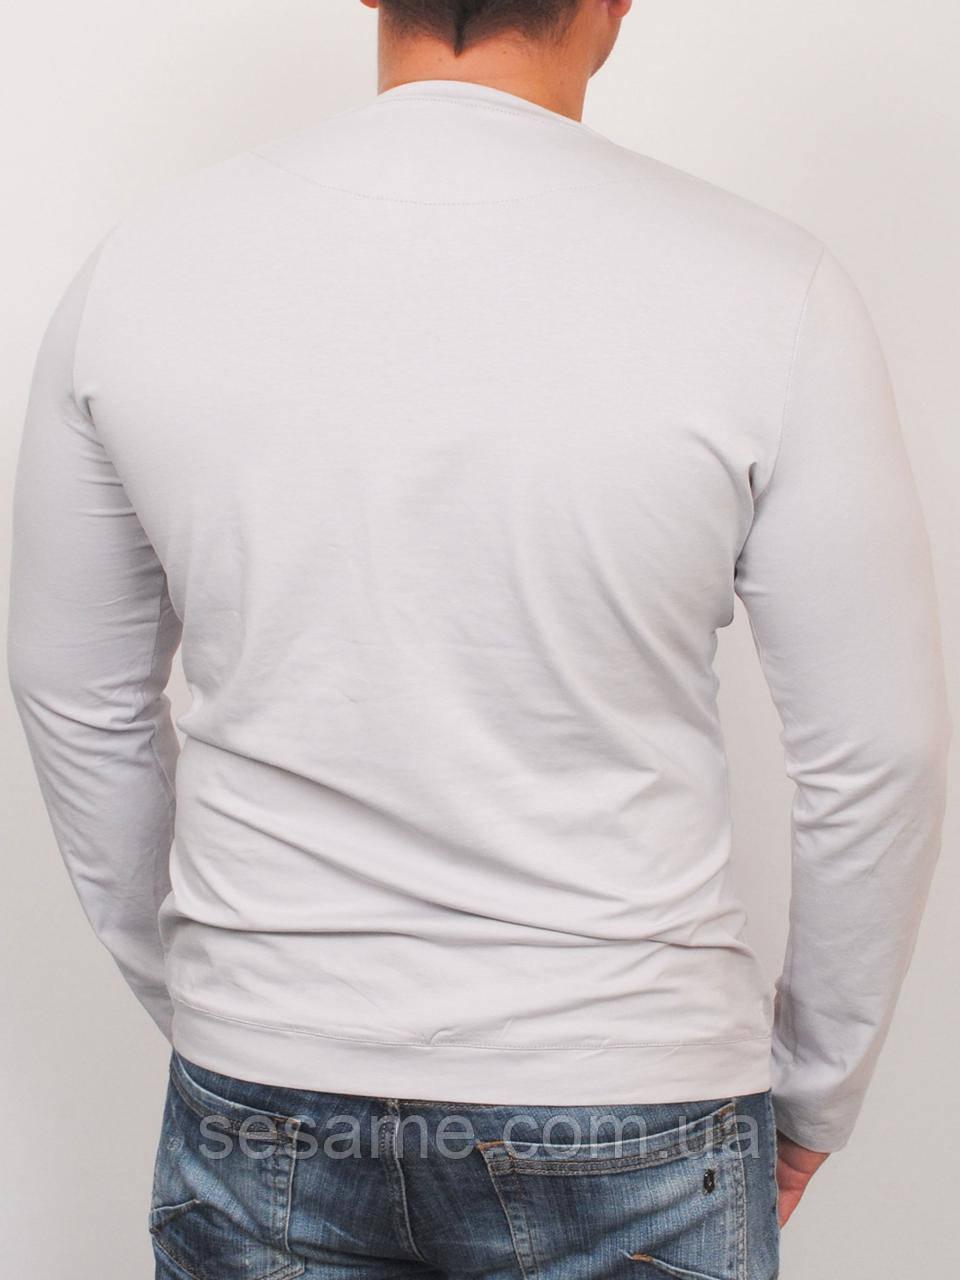 9b537fc4da490 grand ua MEN LONG футболка длинный рукав напрямую из Вьетнама